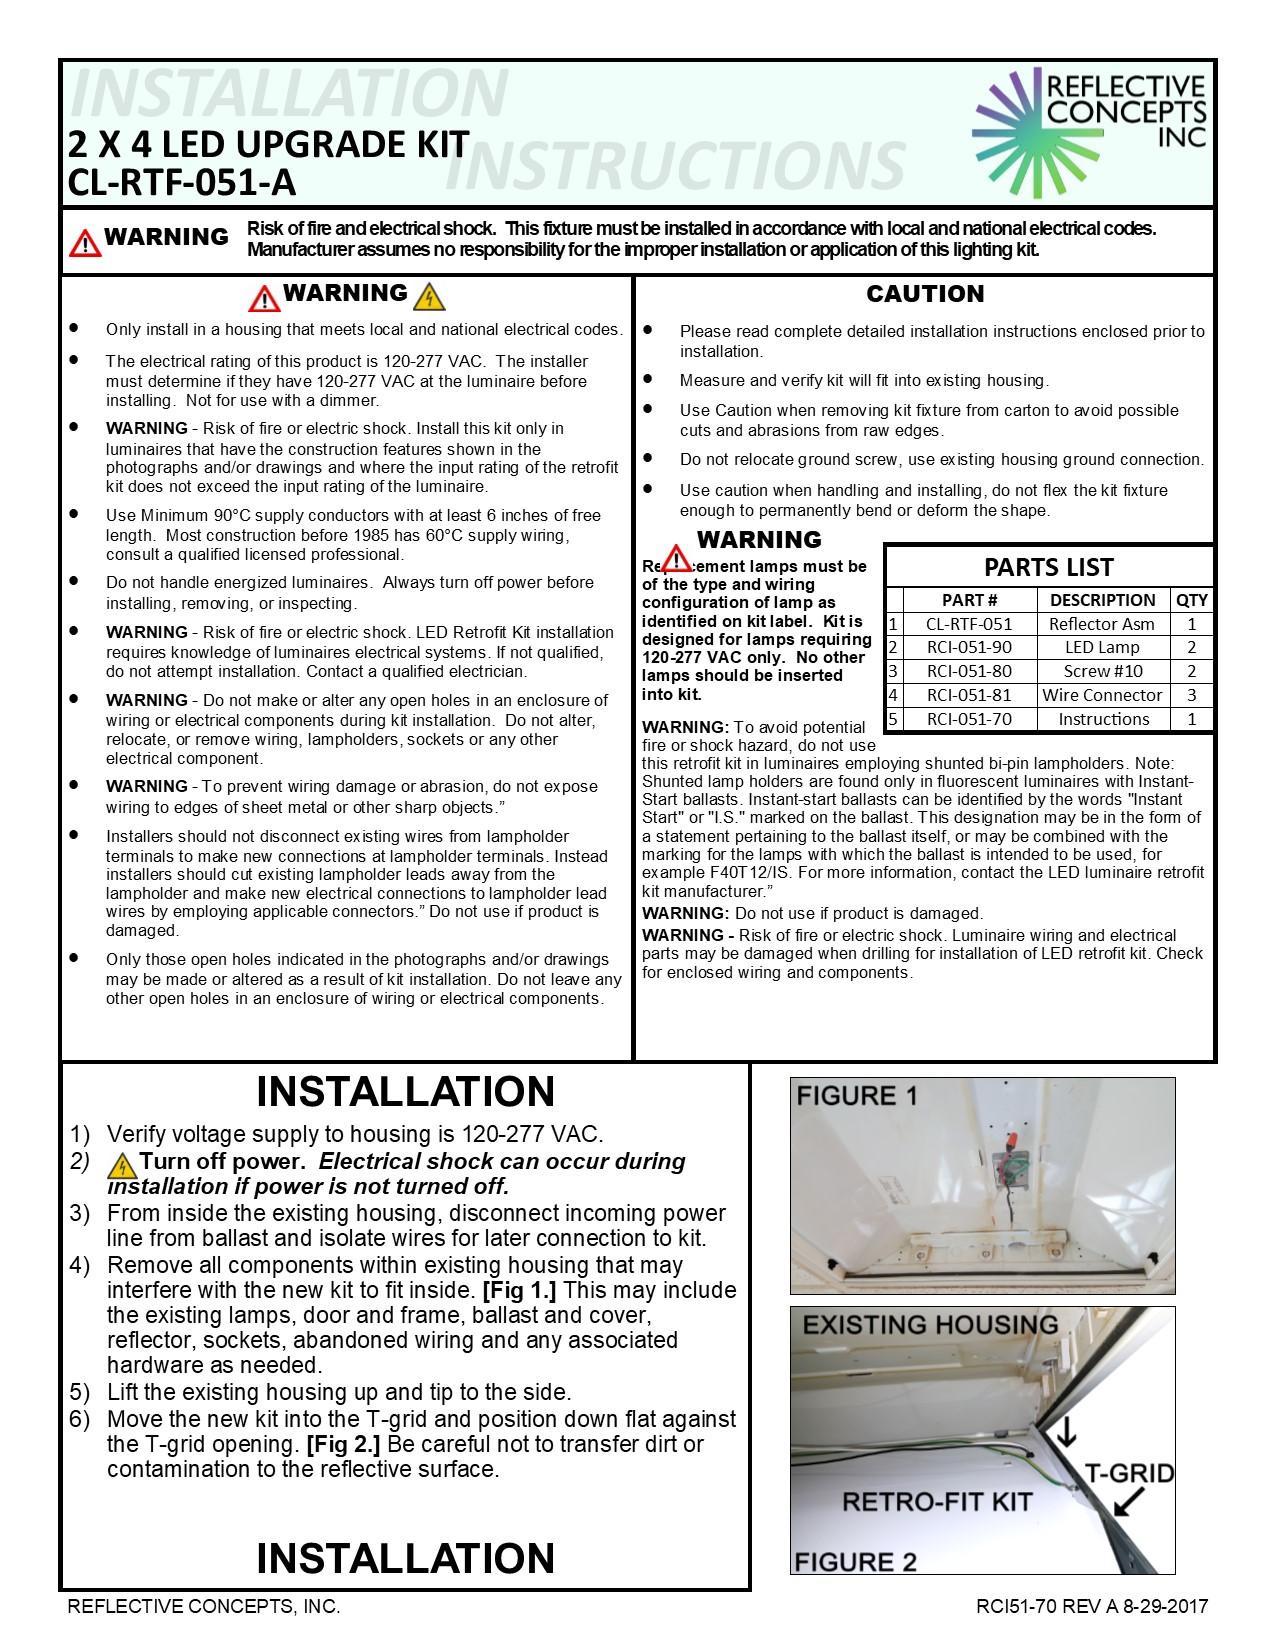 RCI51-70_Install.jpg